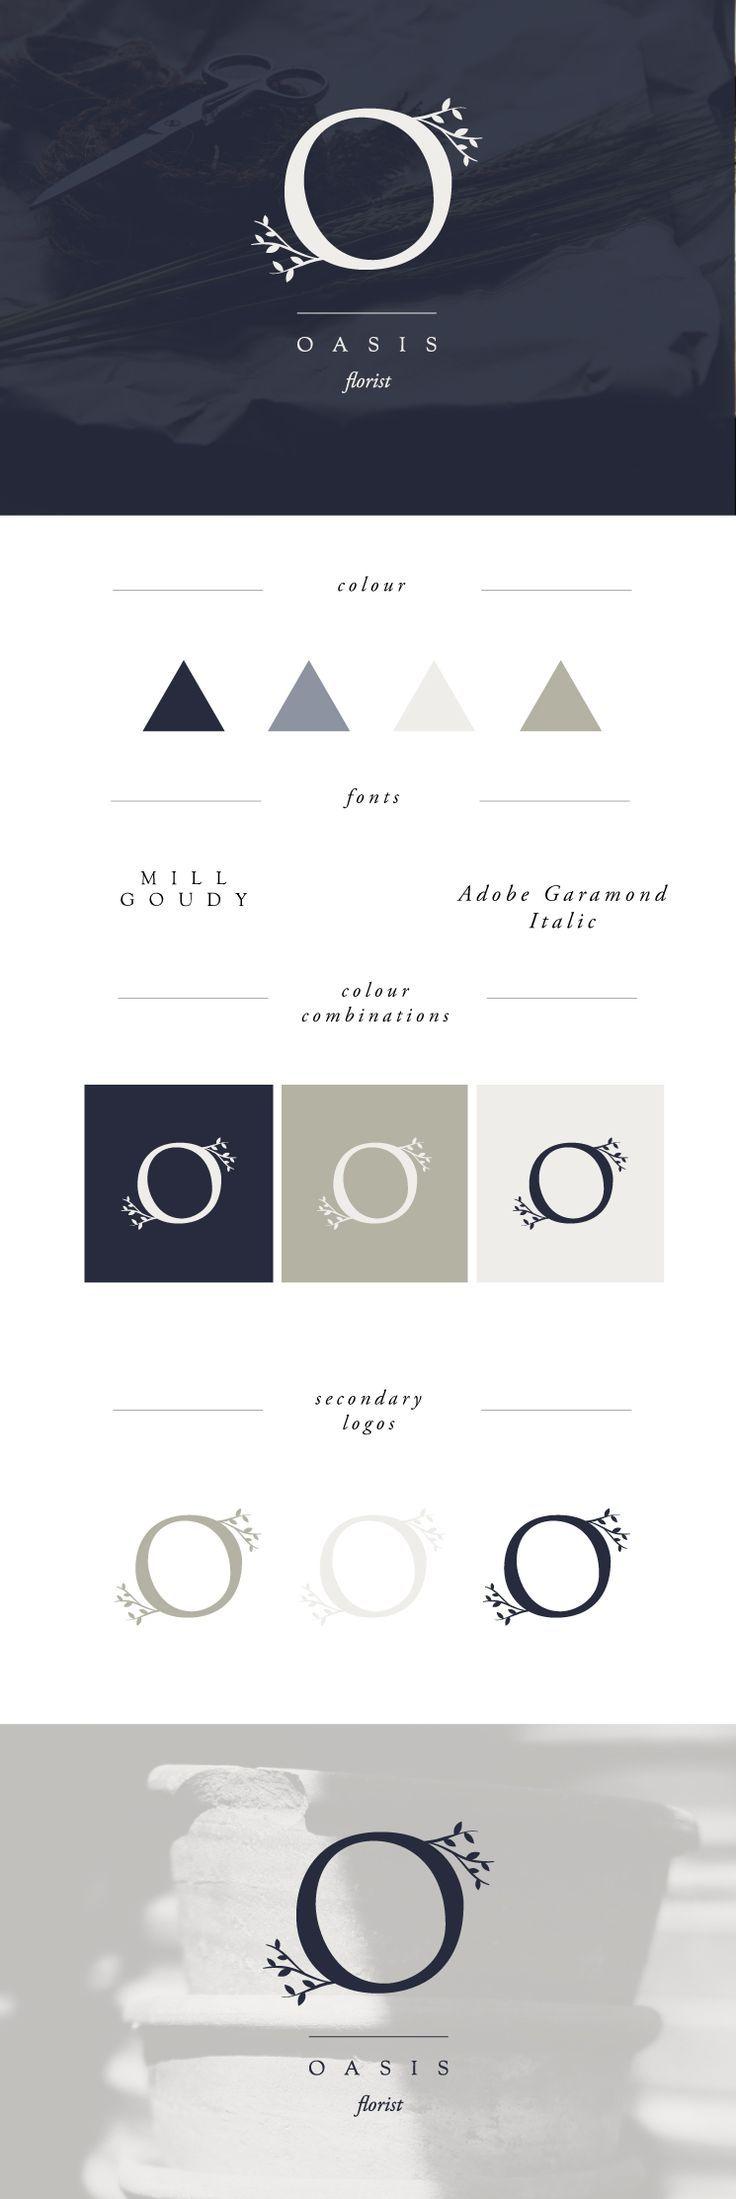 minimal design   minimal logo   logo trends 2017   florist branding   florist logo   modern logo   O logos